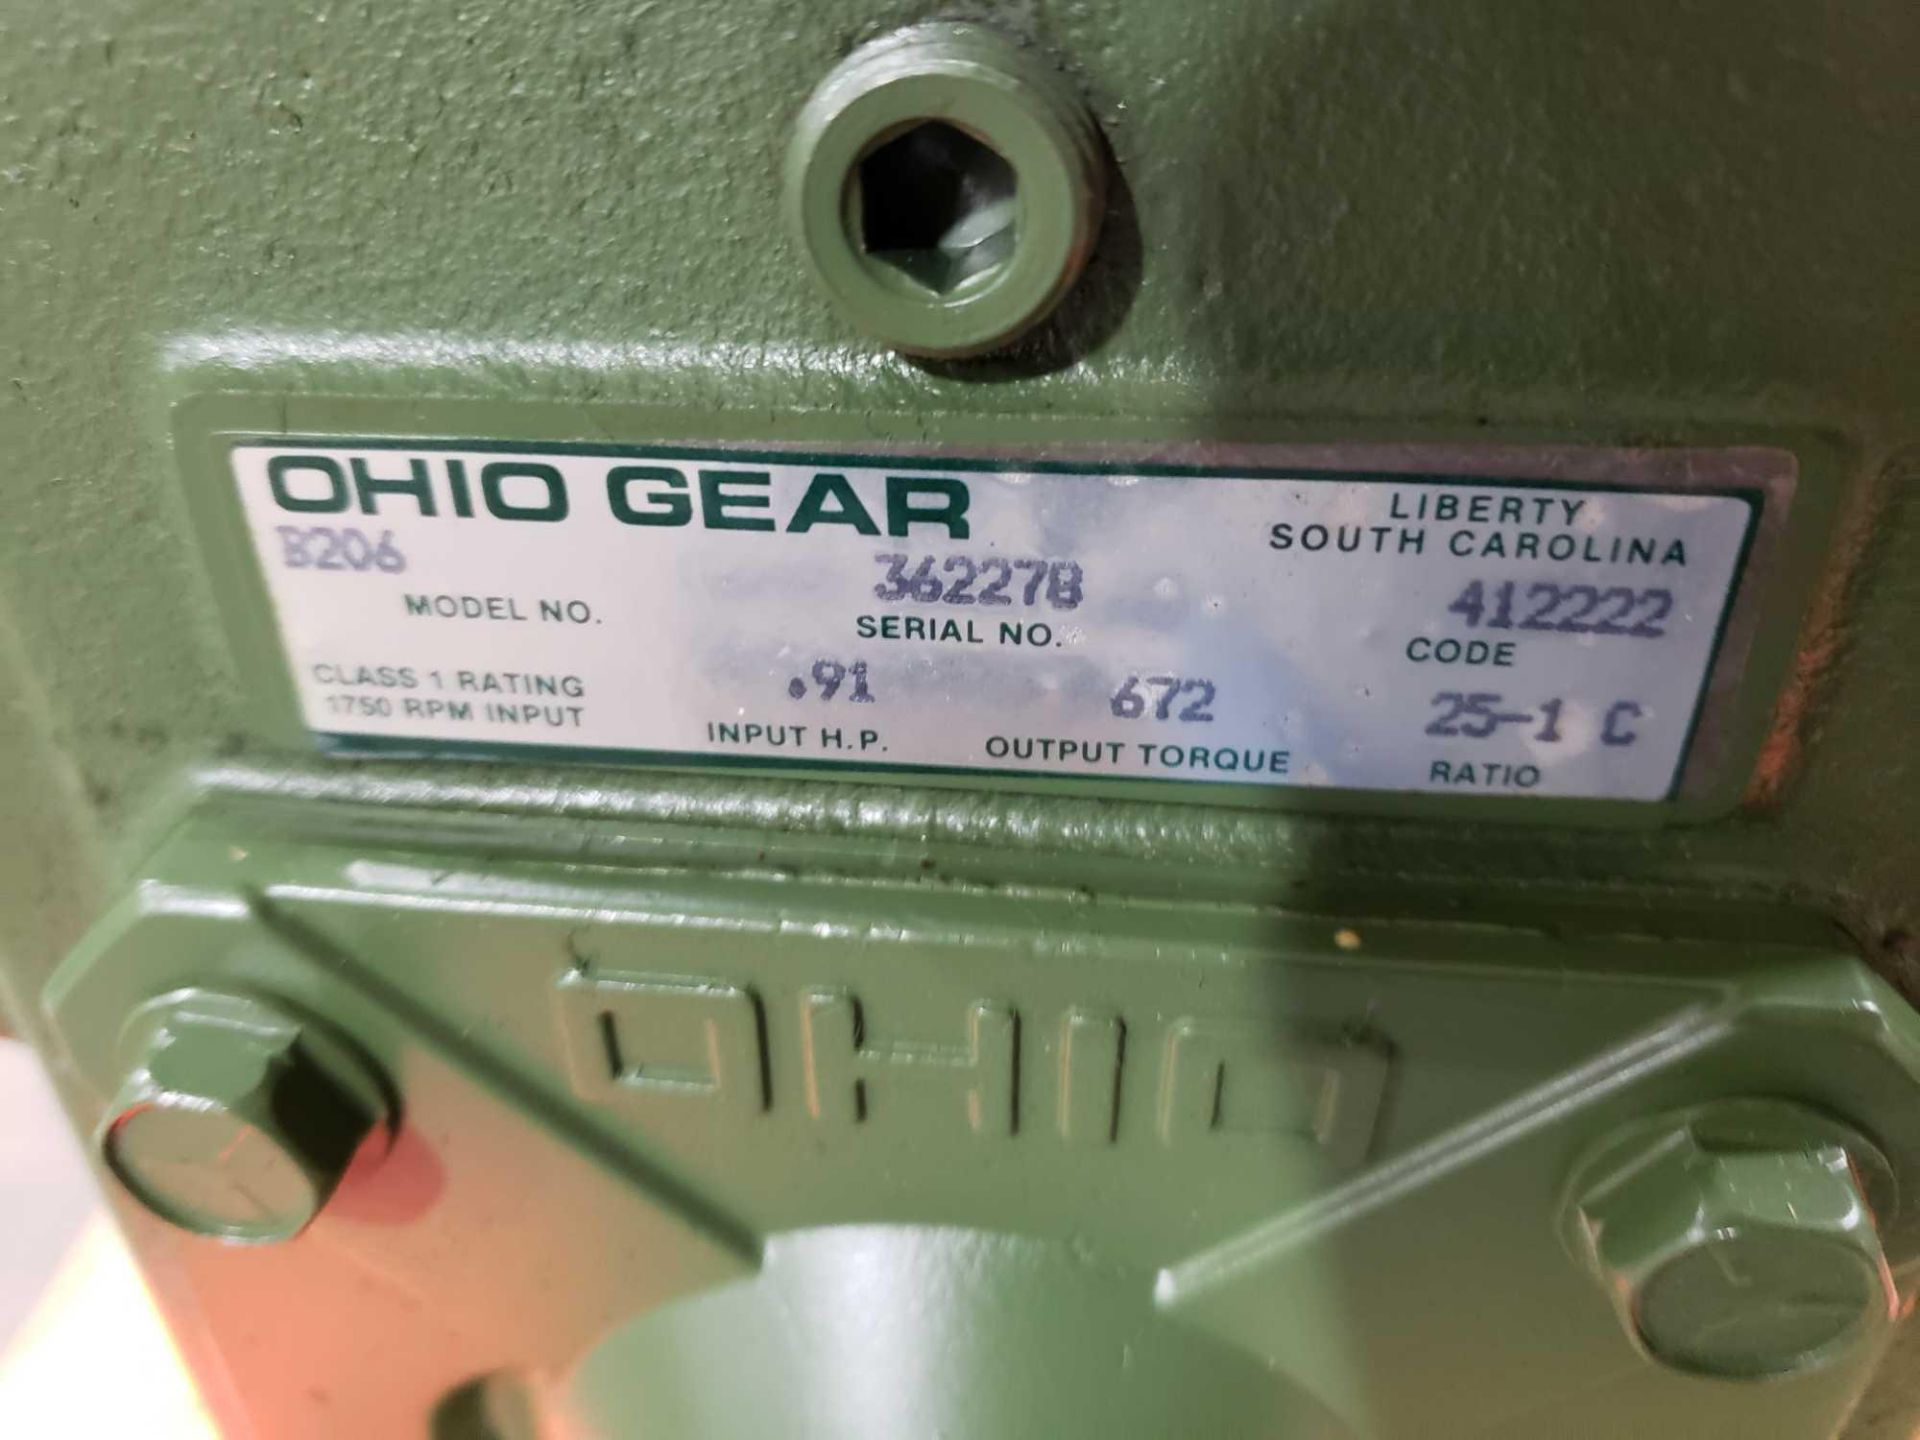 Lot 22 - Ohio Gear model B206 gear box. 25:1 ratio. New in box.